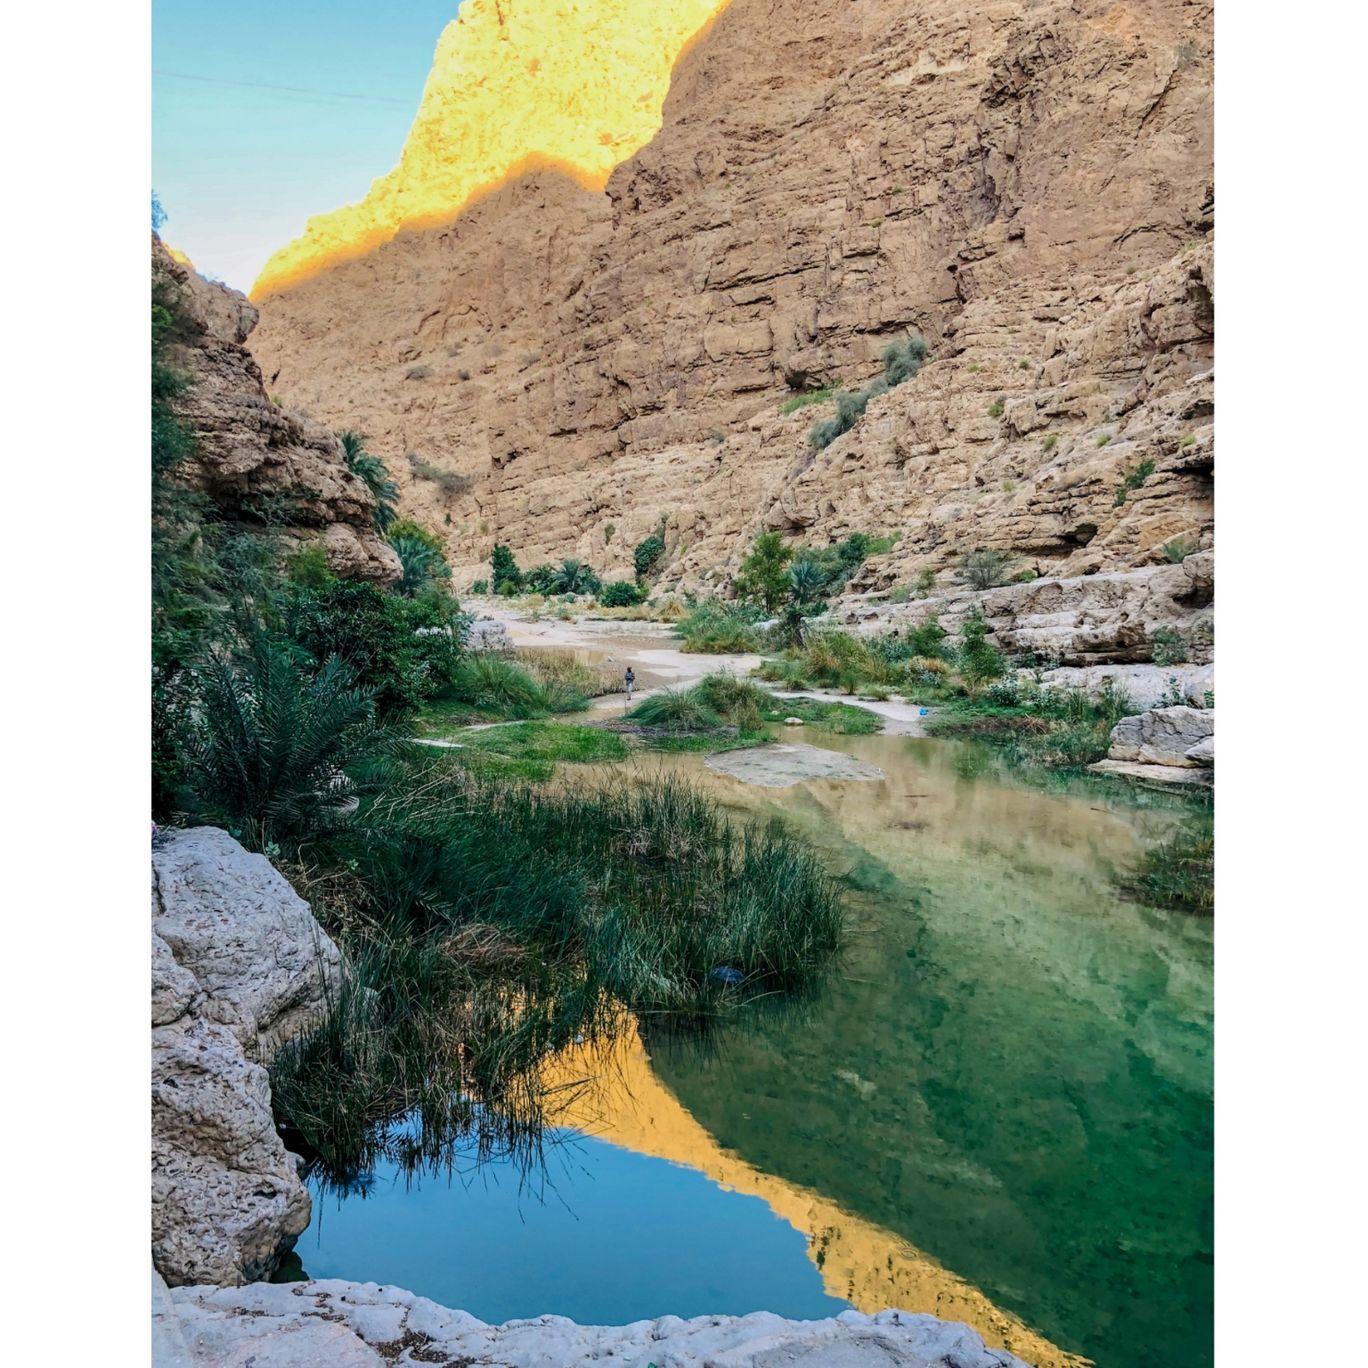 Photo of Wadi Ash Shab By Kid-.